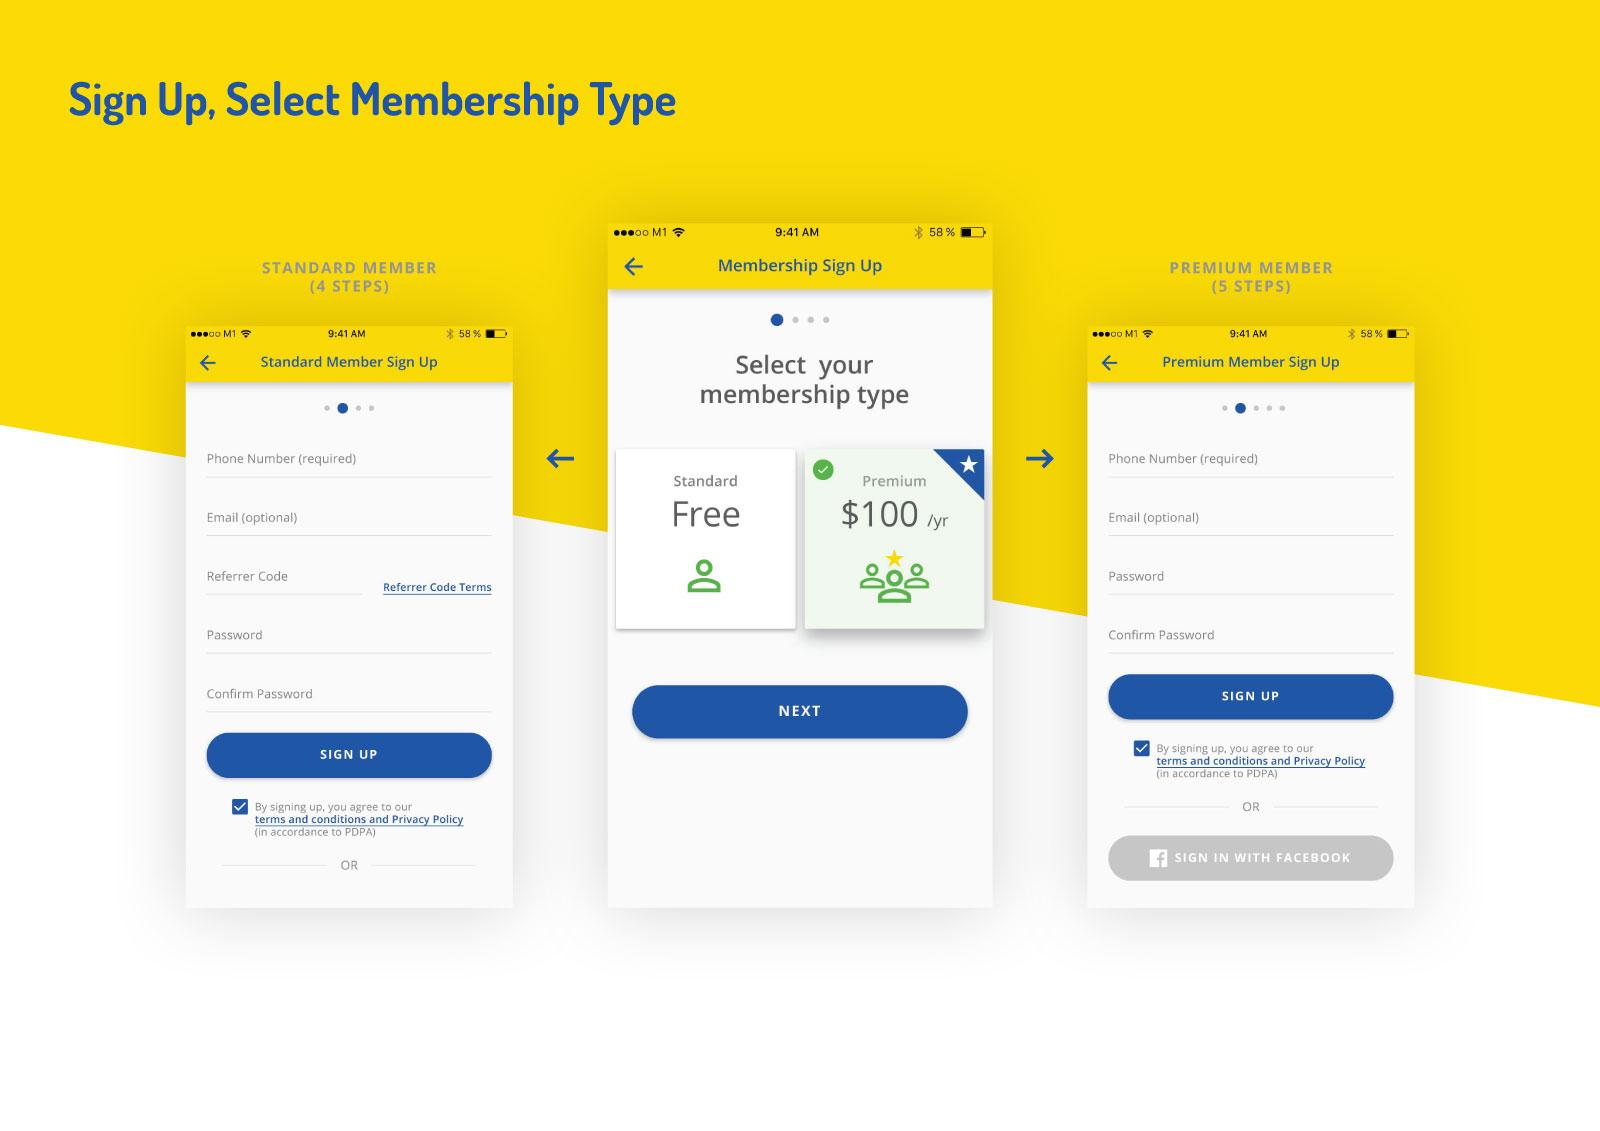 Asset Snaps - Sign Up, Select Membership Type